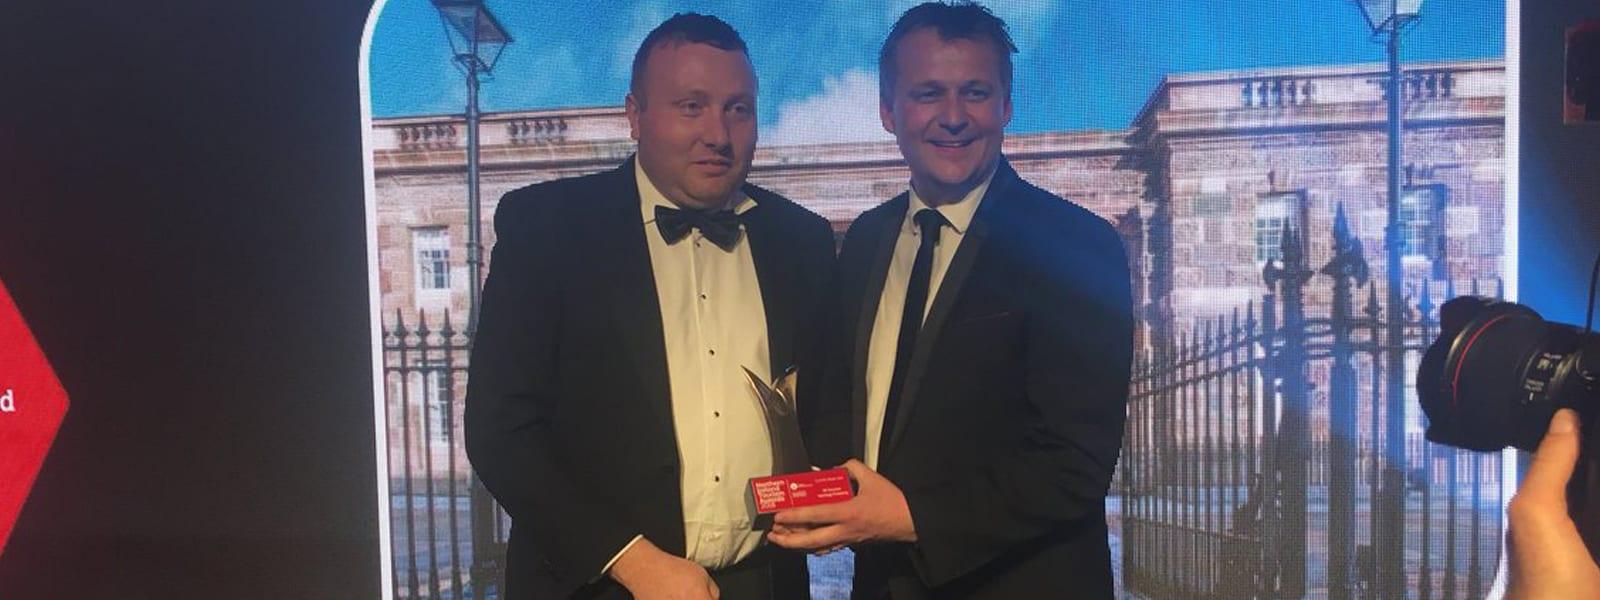 Crumlin Road Gaol winners at NI Tourism Awards